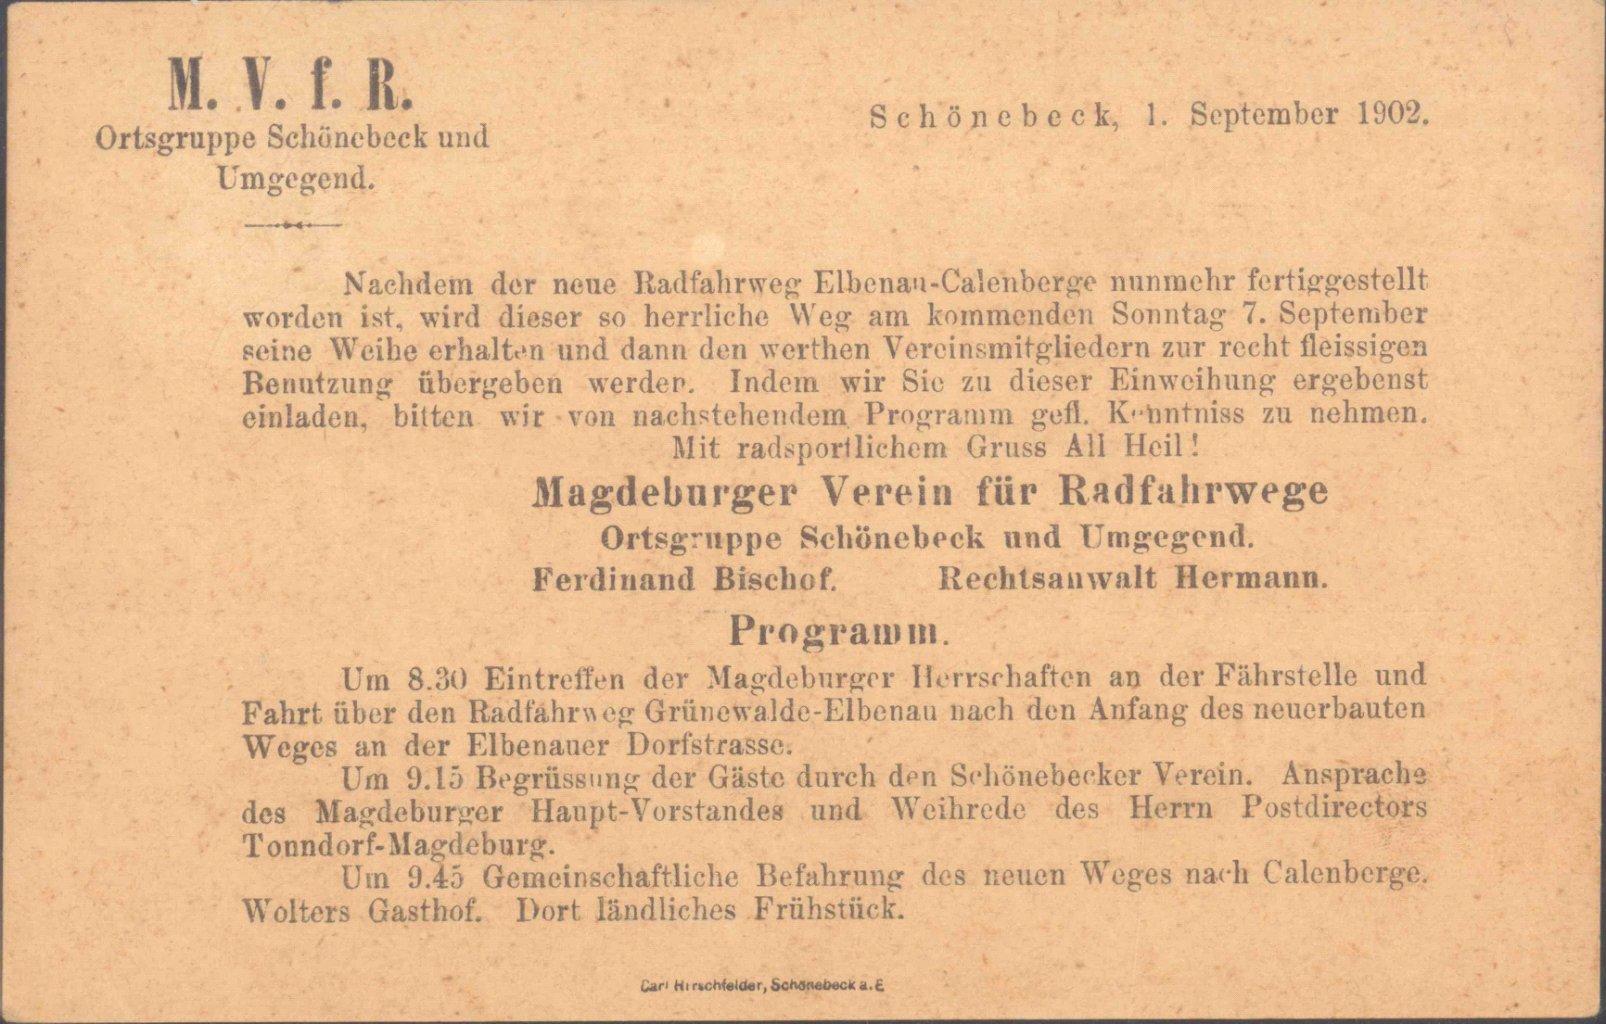 MOTIV RADFAHRER! 1902 SCHÖNEBECK, HEIMAT MAGDEBURG